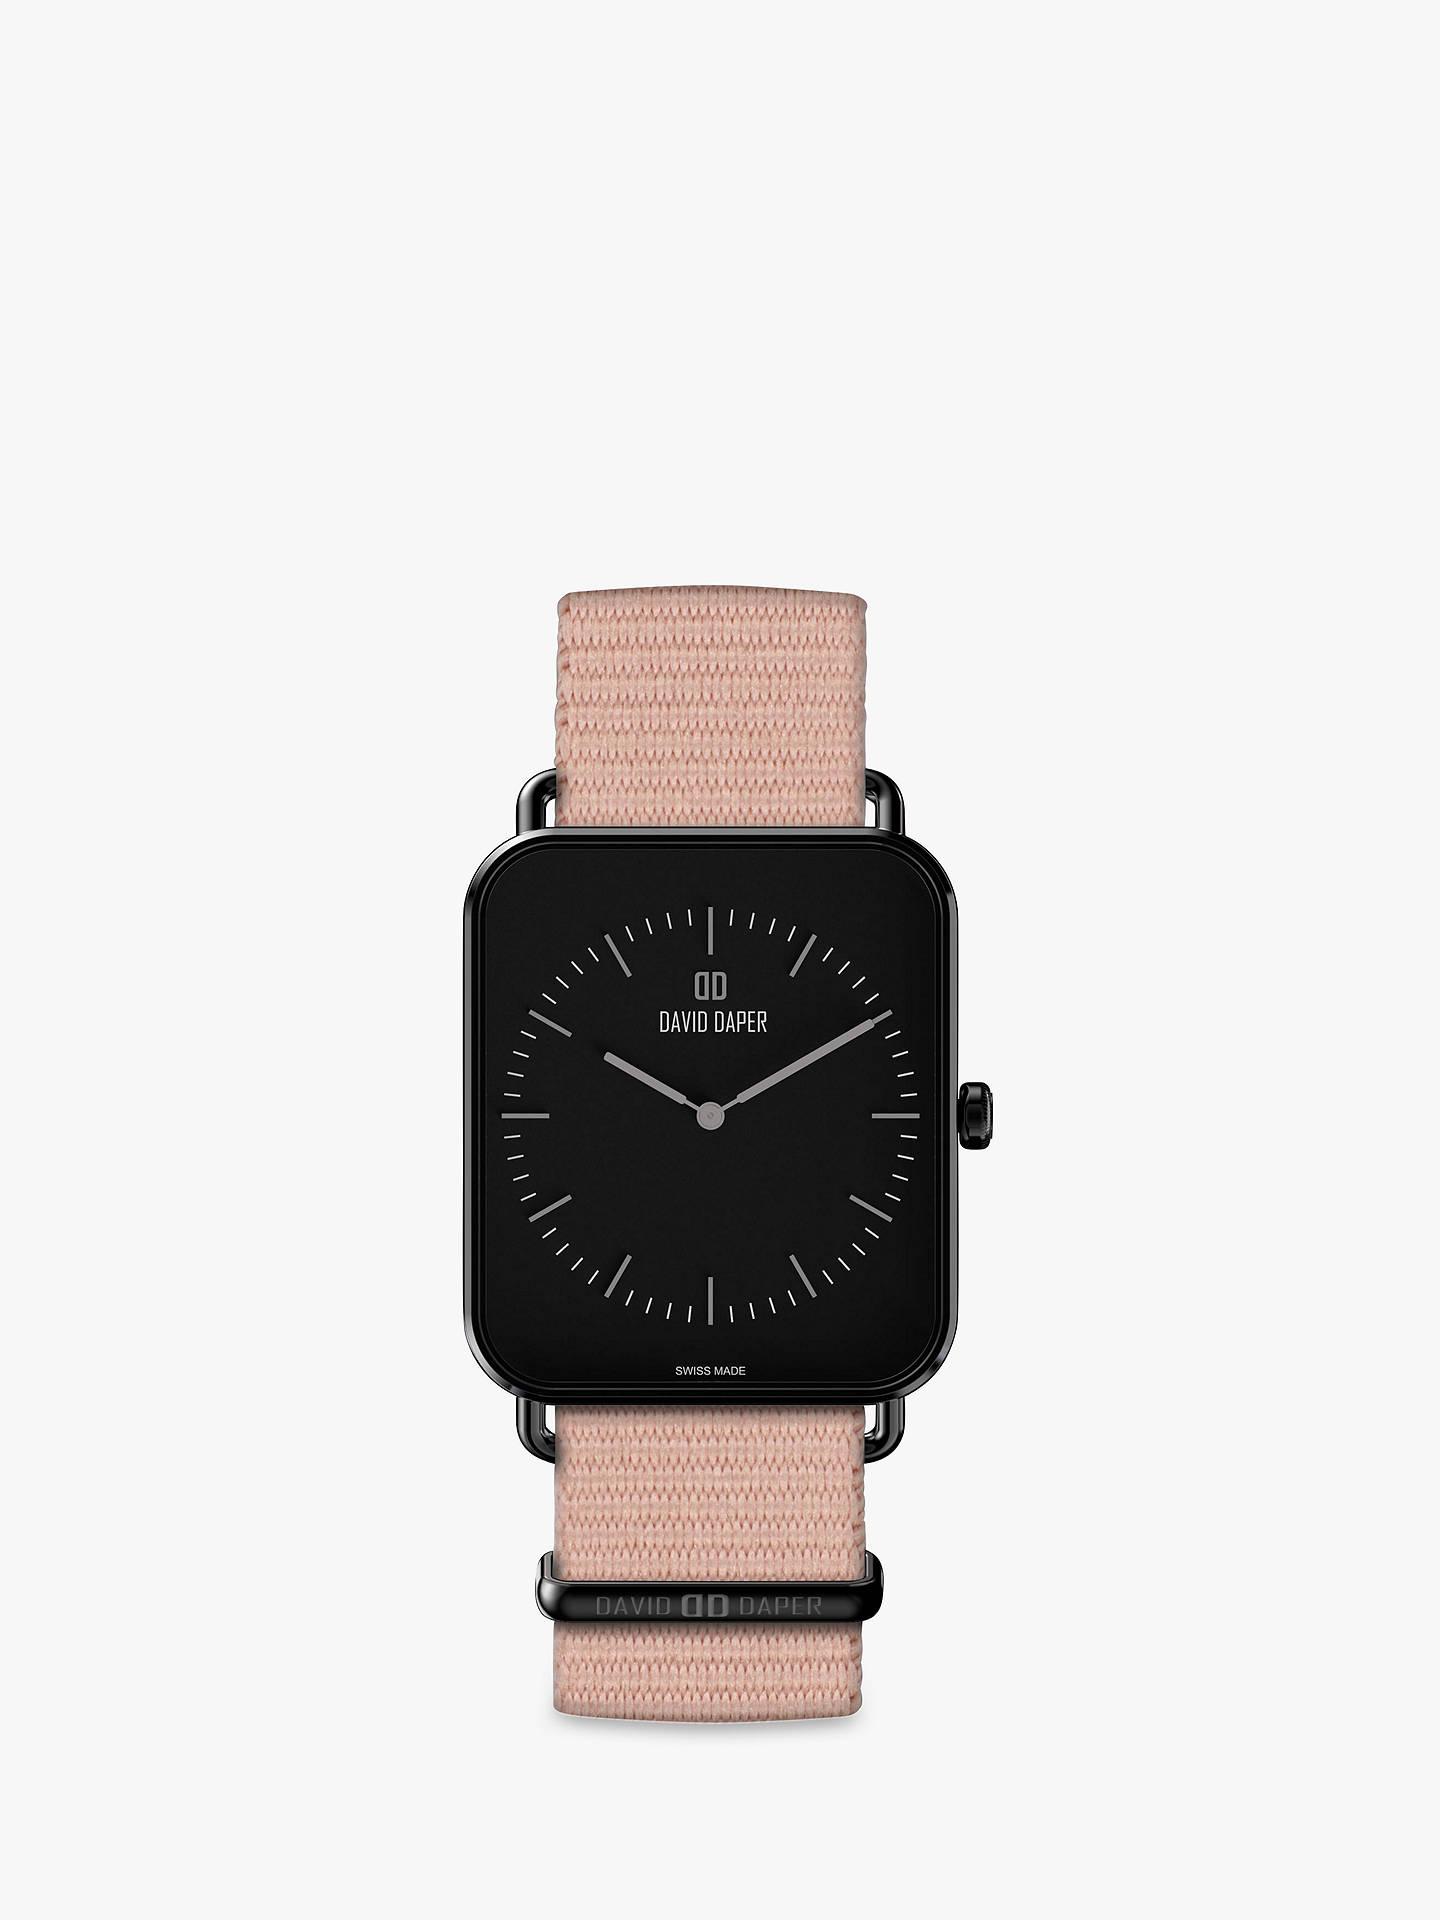 BuyDavid Daper Women s Rectangular Fabric Strap Watch Pink Black 01BL02N01 line at johnlewis